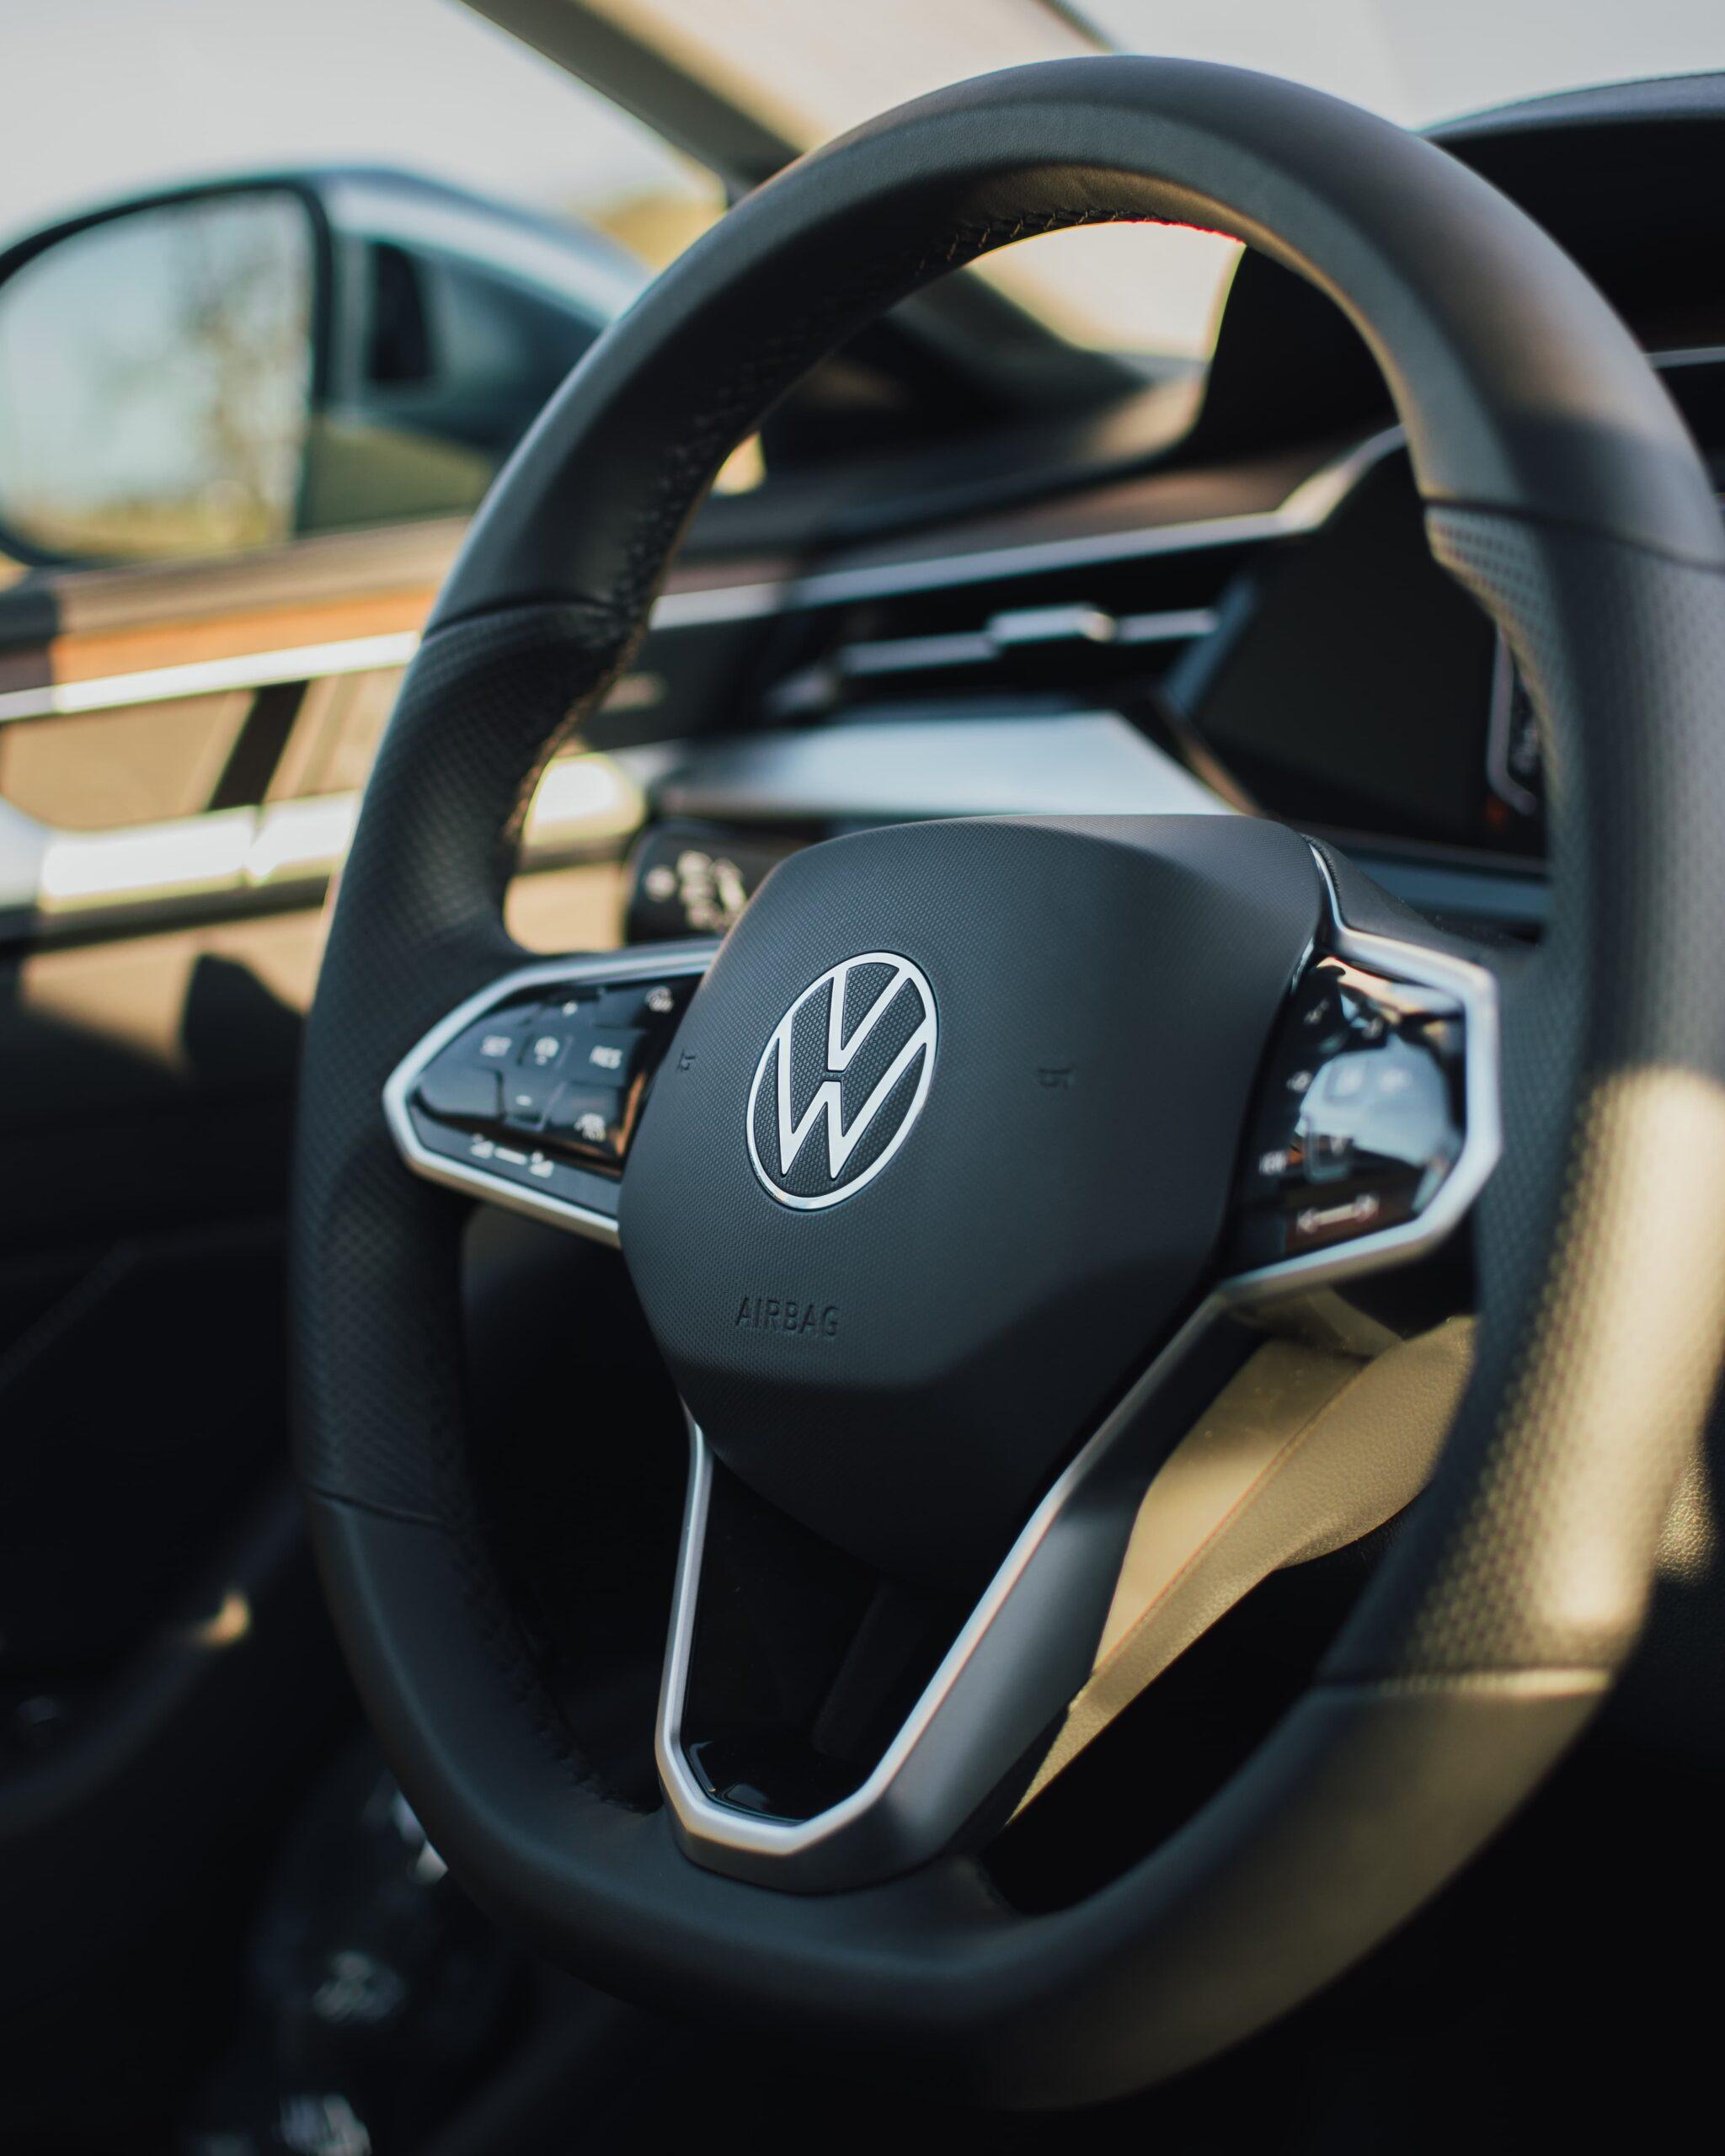 VW_Arteon_SB_digital_cockpit_1